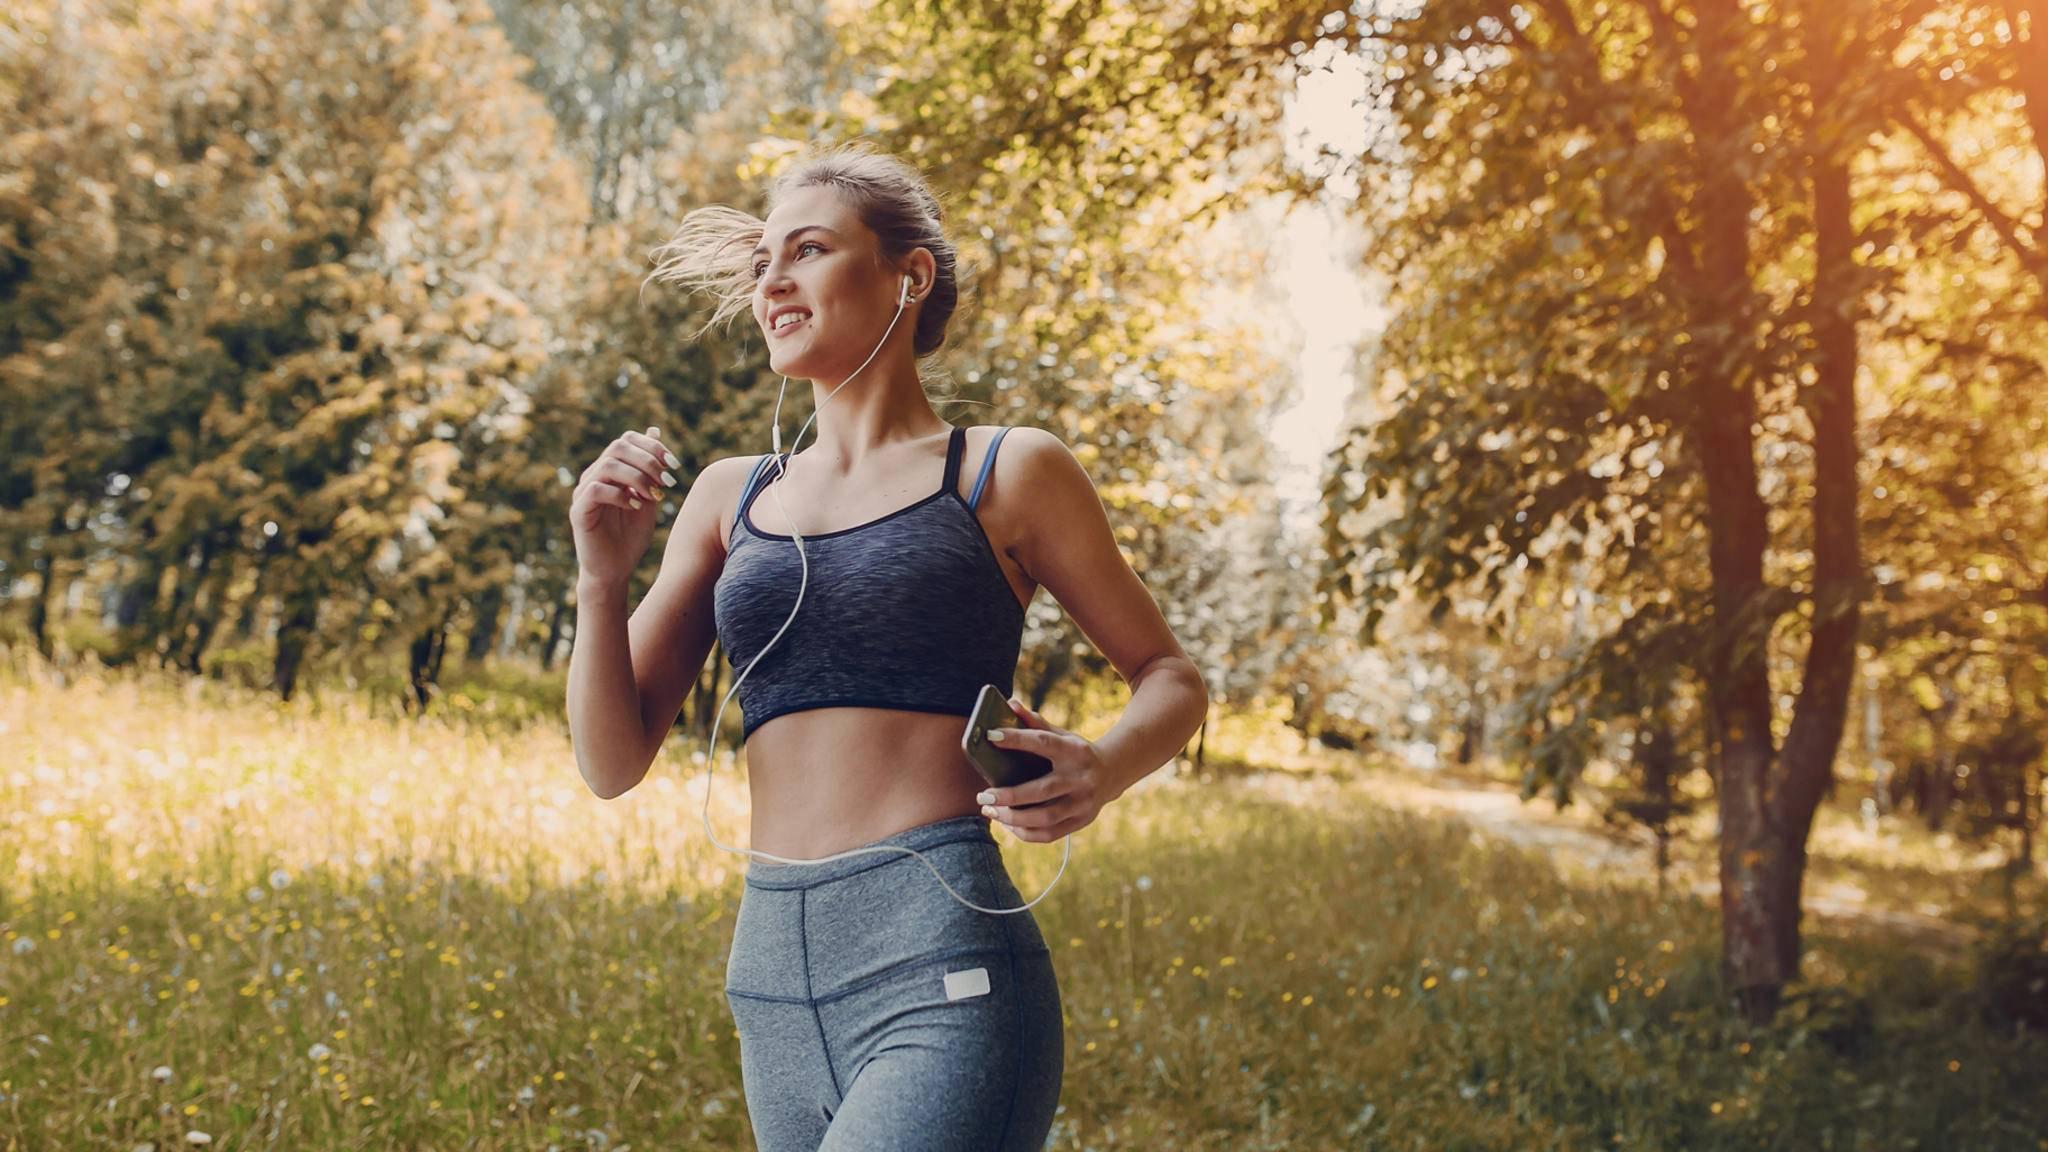 joggen laufen wald frau smartphone frühling